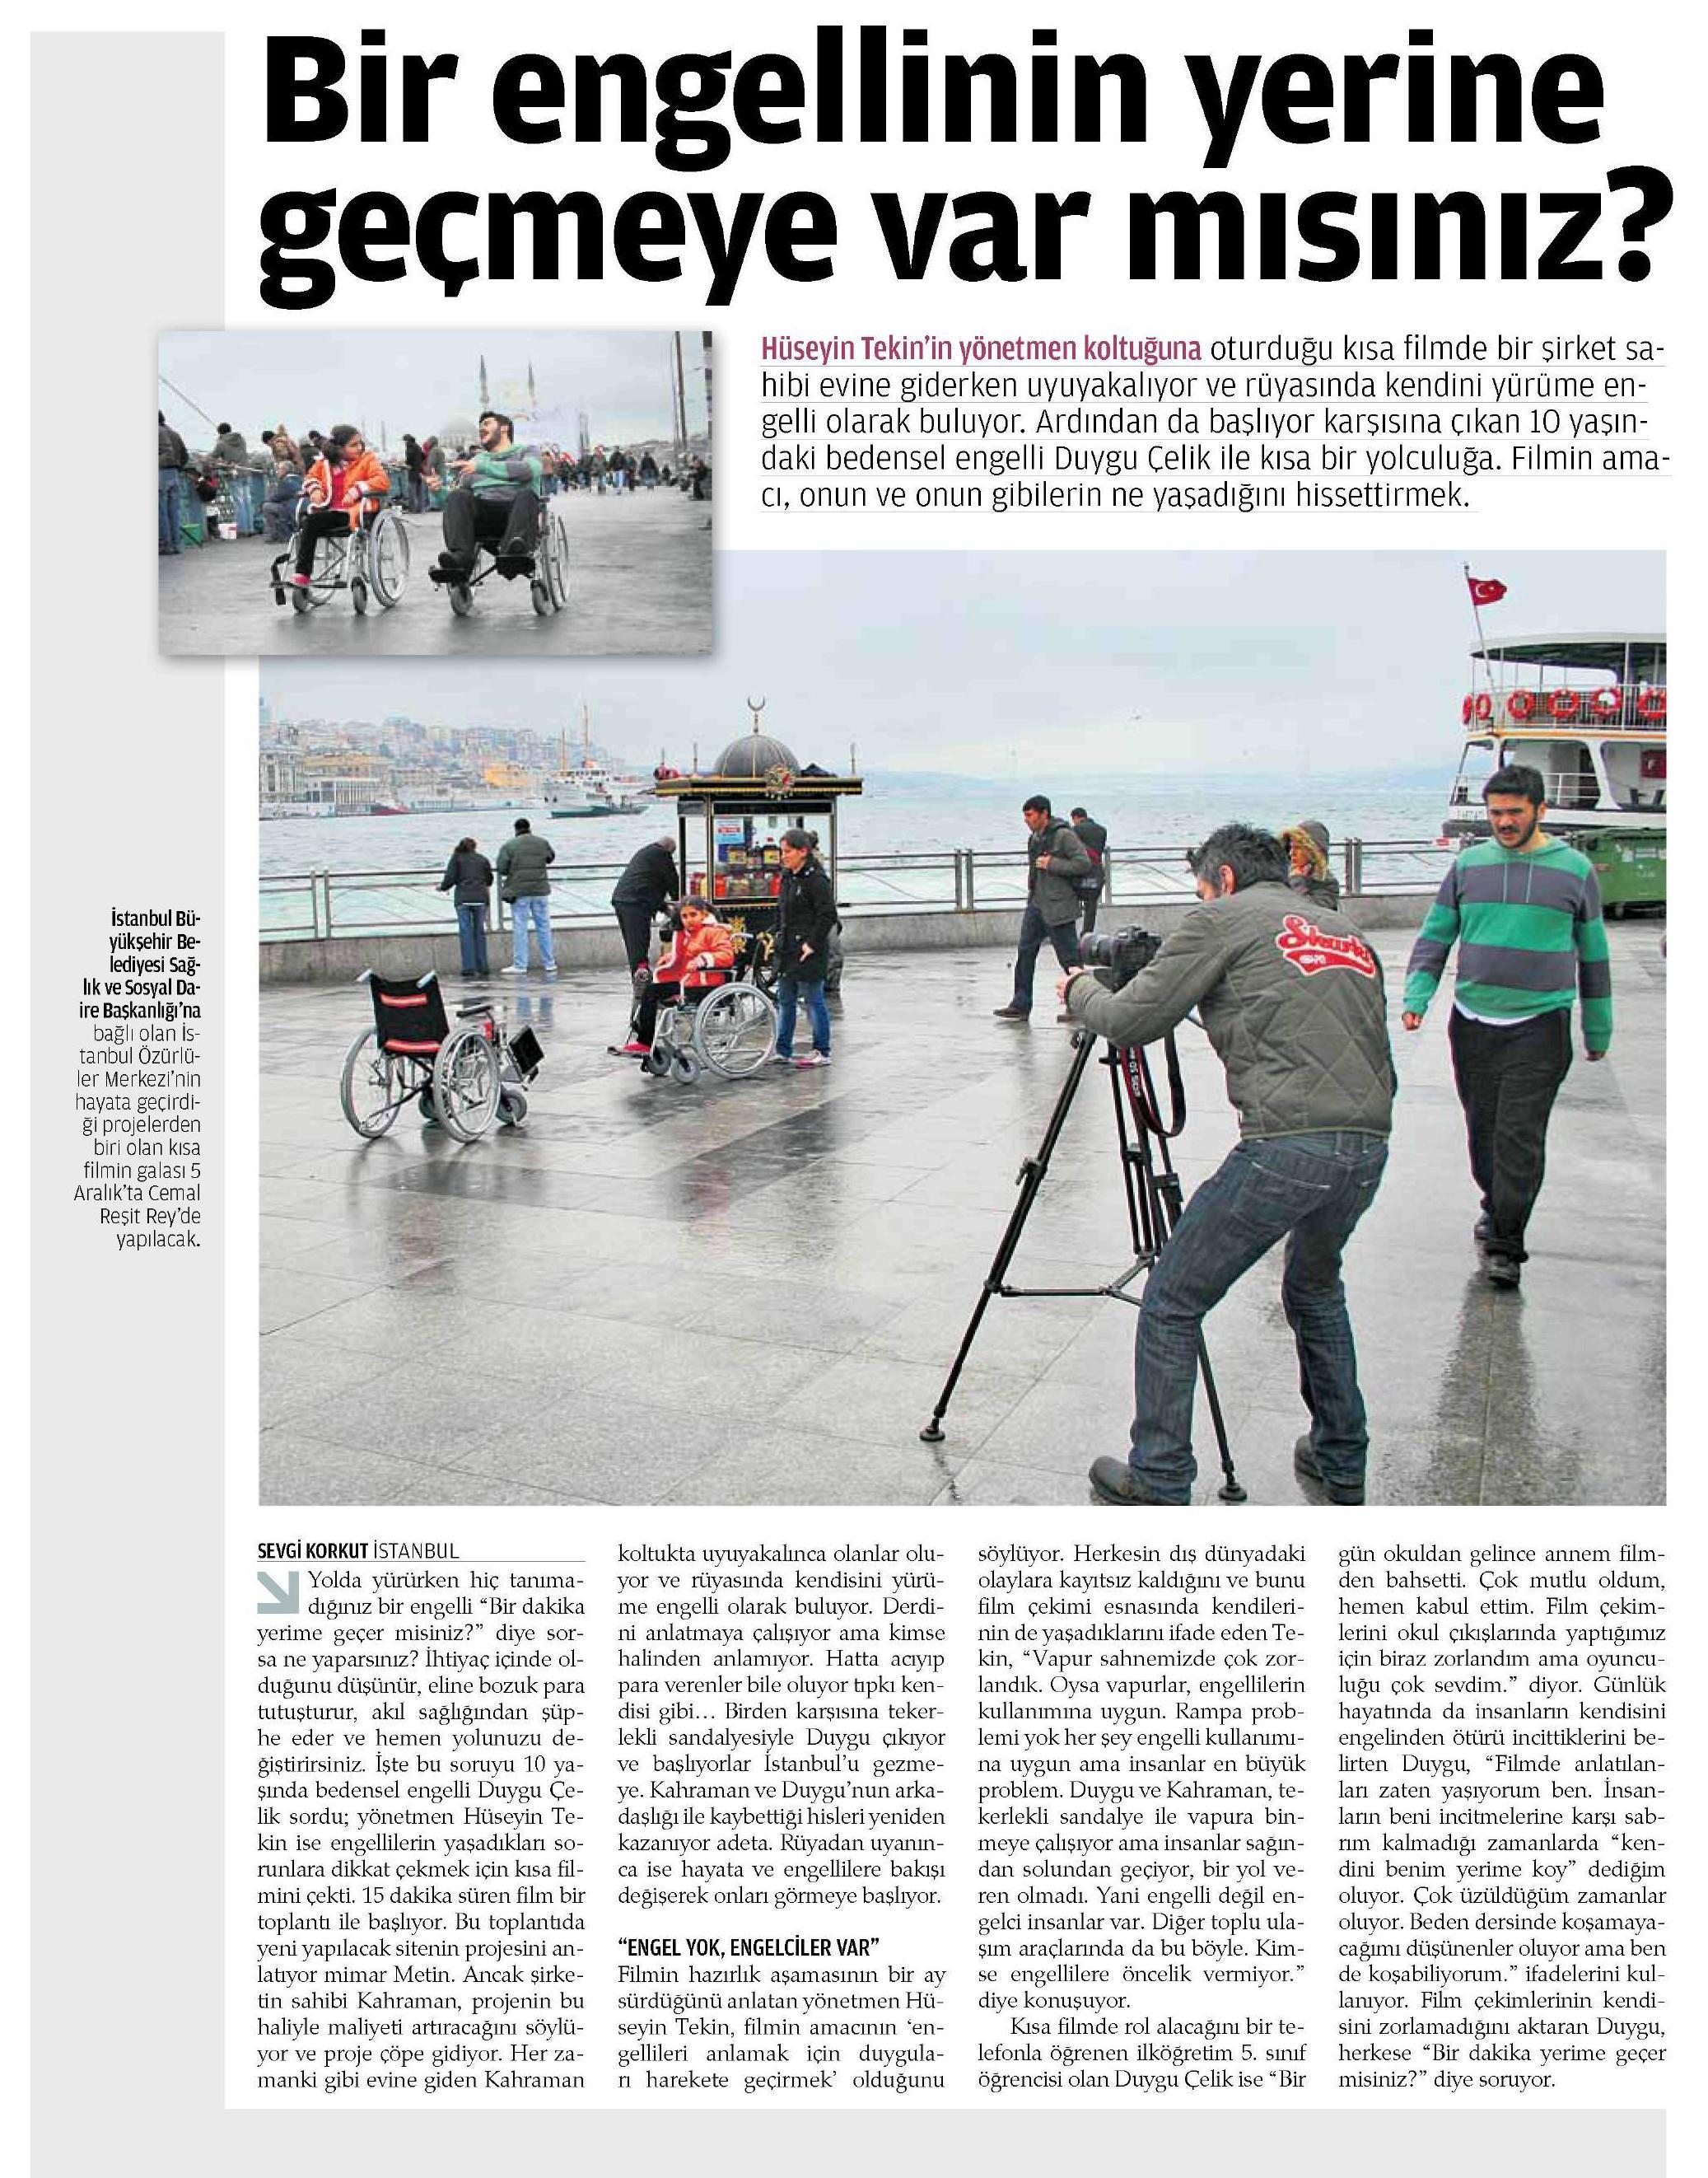 04.12.2011_zaman gazetesfilm